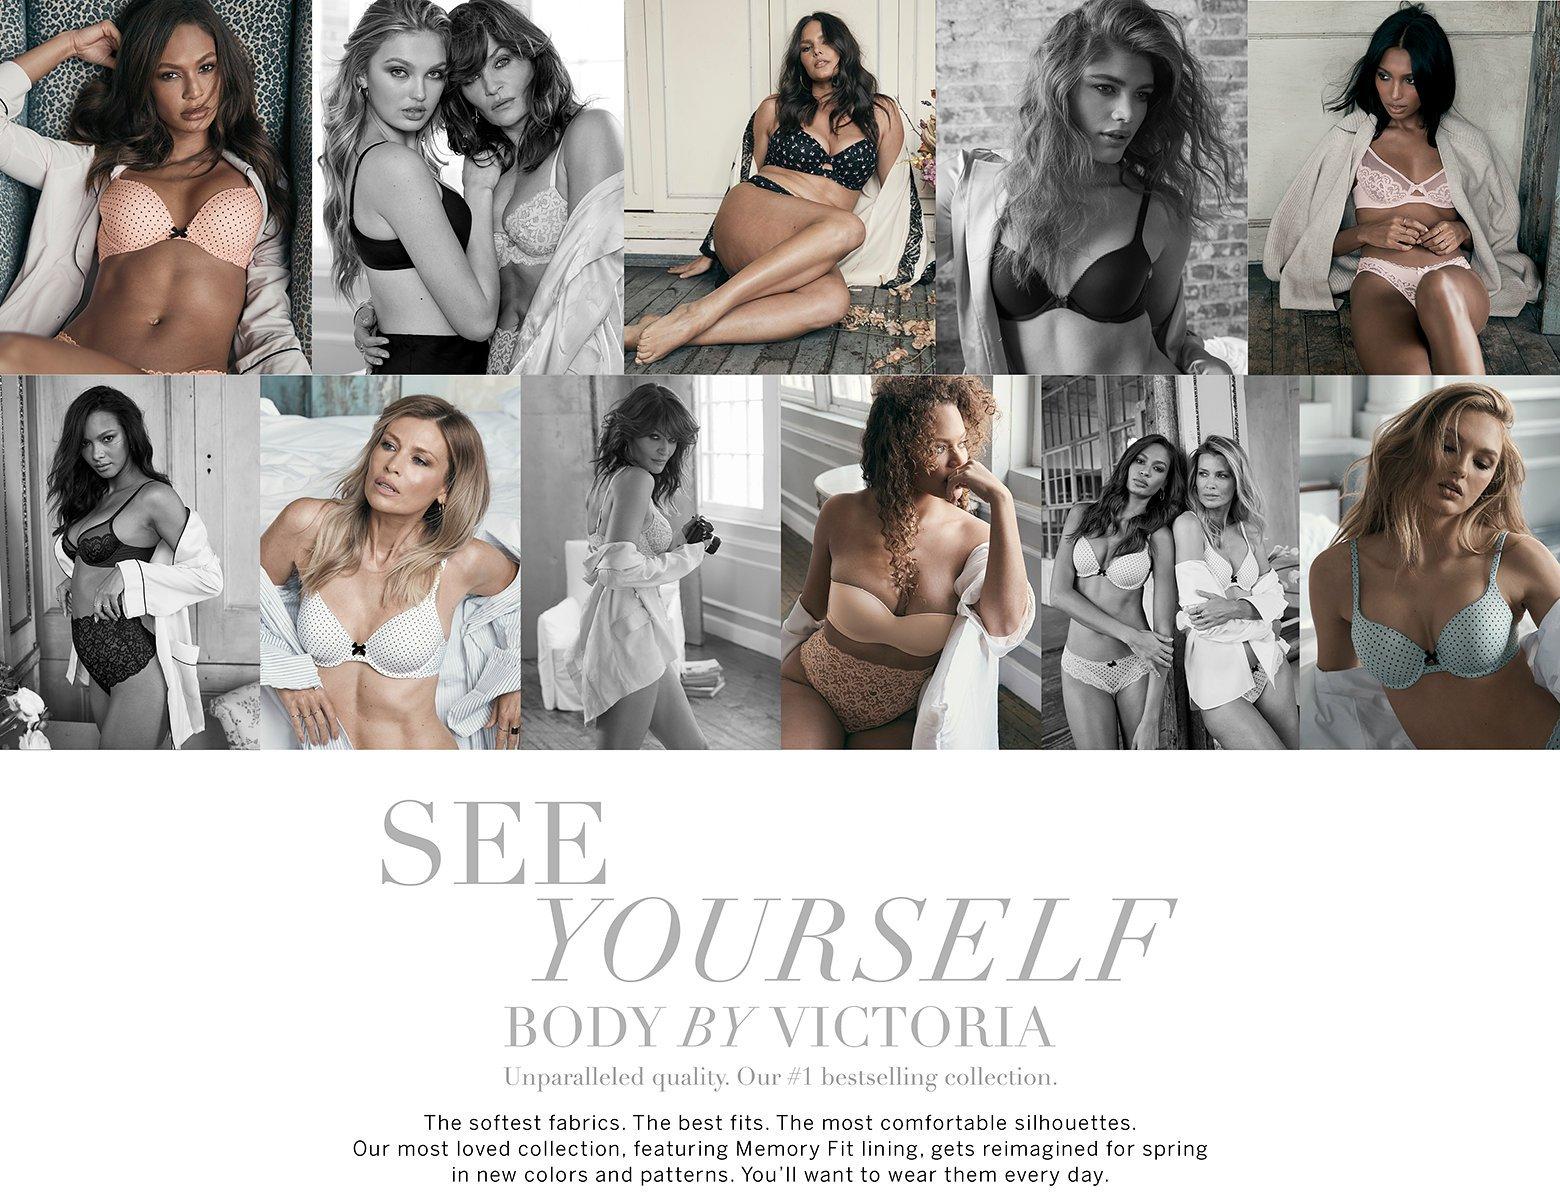 Victorias Secret BBV Body by Victoria Lined Demi or P//C 32 34 36 Aqua Lace NWT